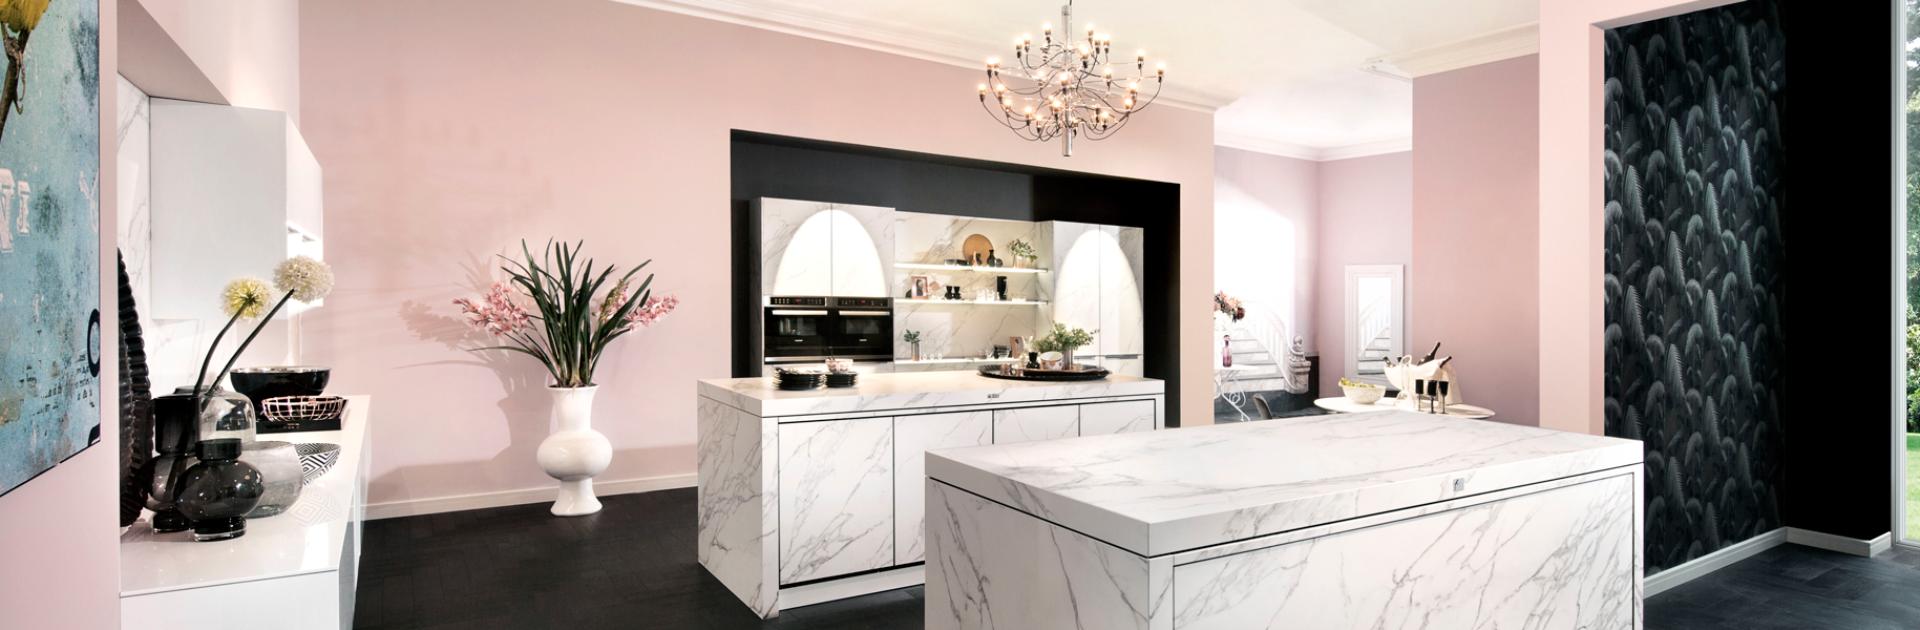 Luxe klassieke keuken | Satink Keukens